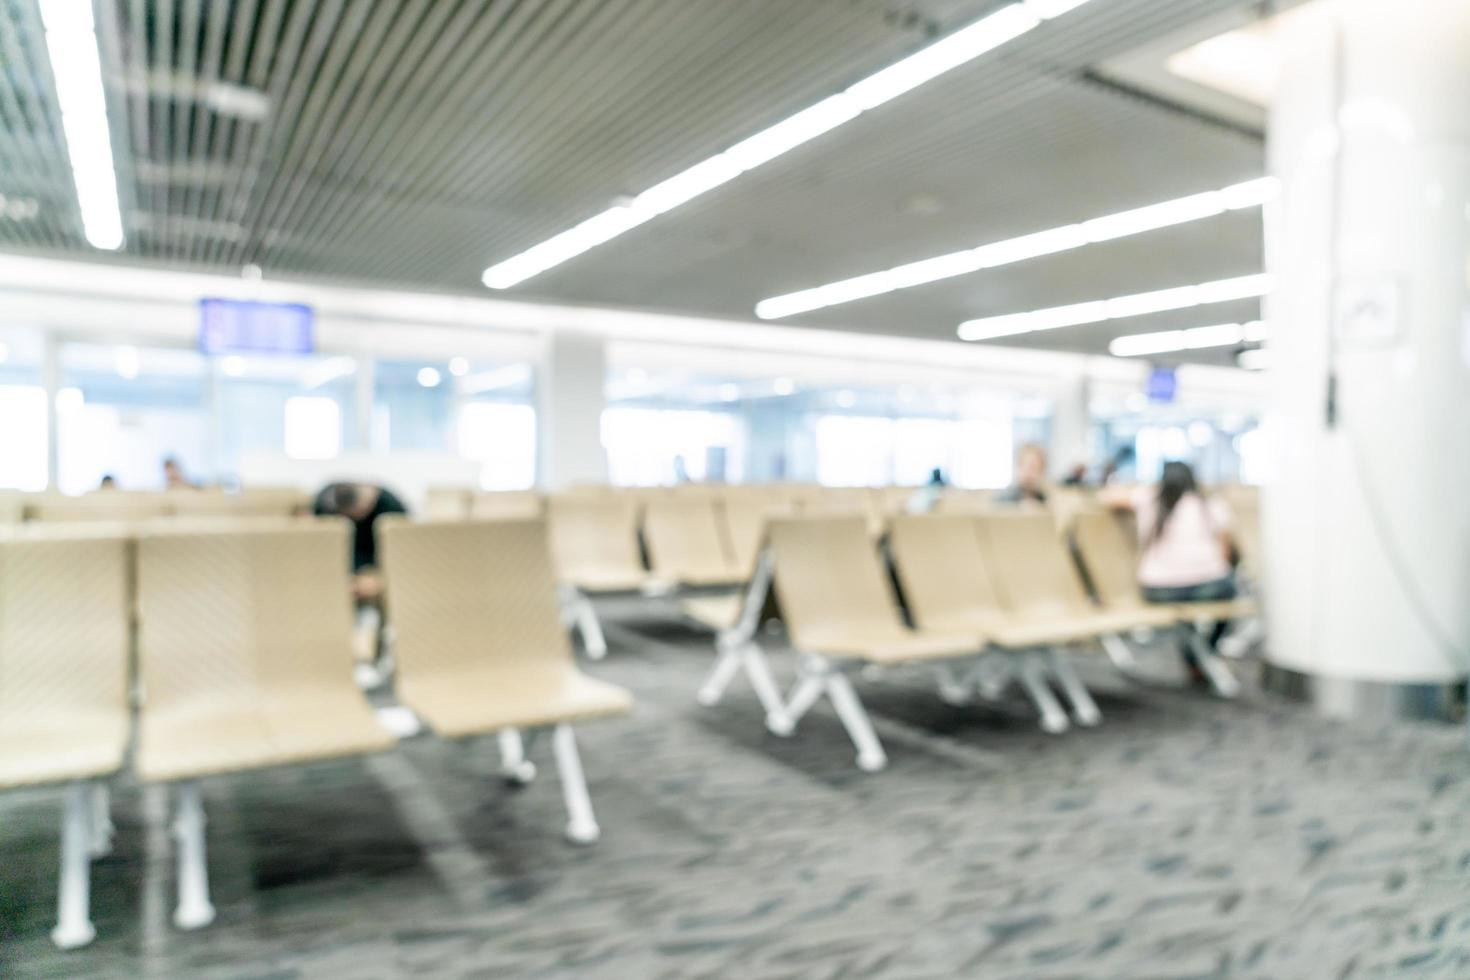 abstracte vervaging in luchthaven voor achtergrond foto